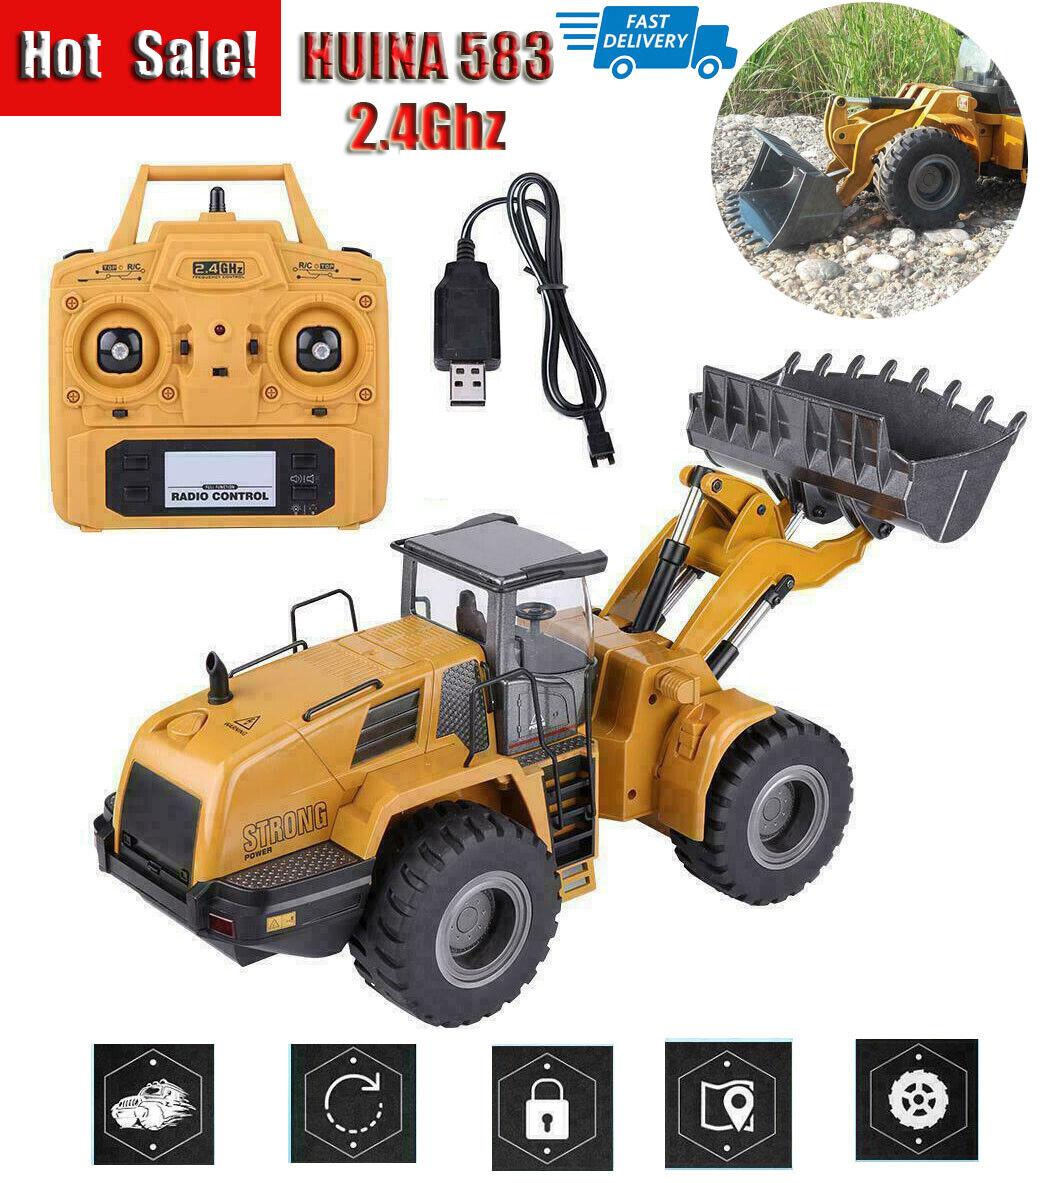 Huina583 1583 RC rueda  loader Half Metal Excavator Electric Engineering Vehicle  i nuovi marchi outlet online